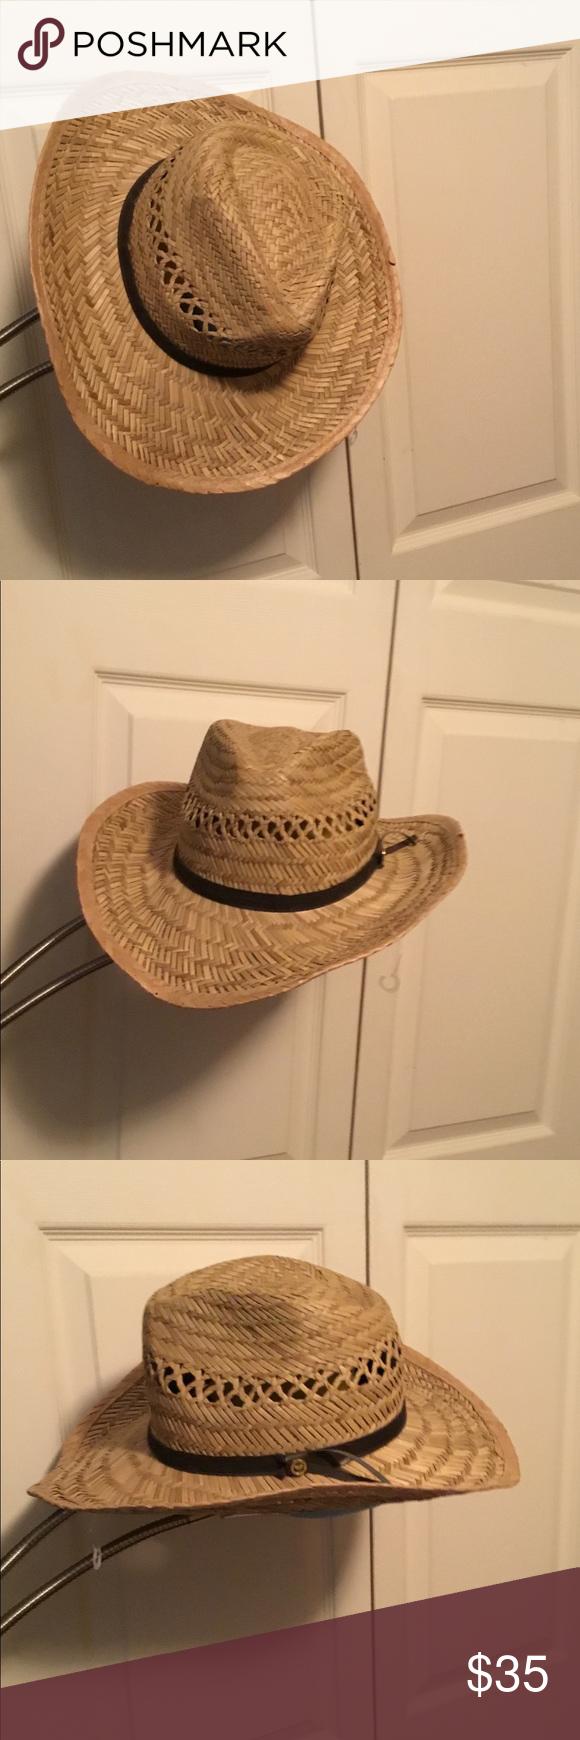 04ad64f7cddf2 Vintage Gold Coast Sunwear Straw Hat In good condition. I figure it s a  medium sized